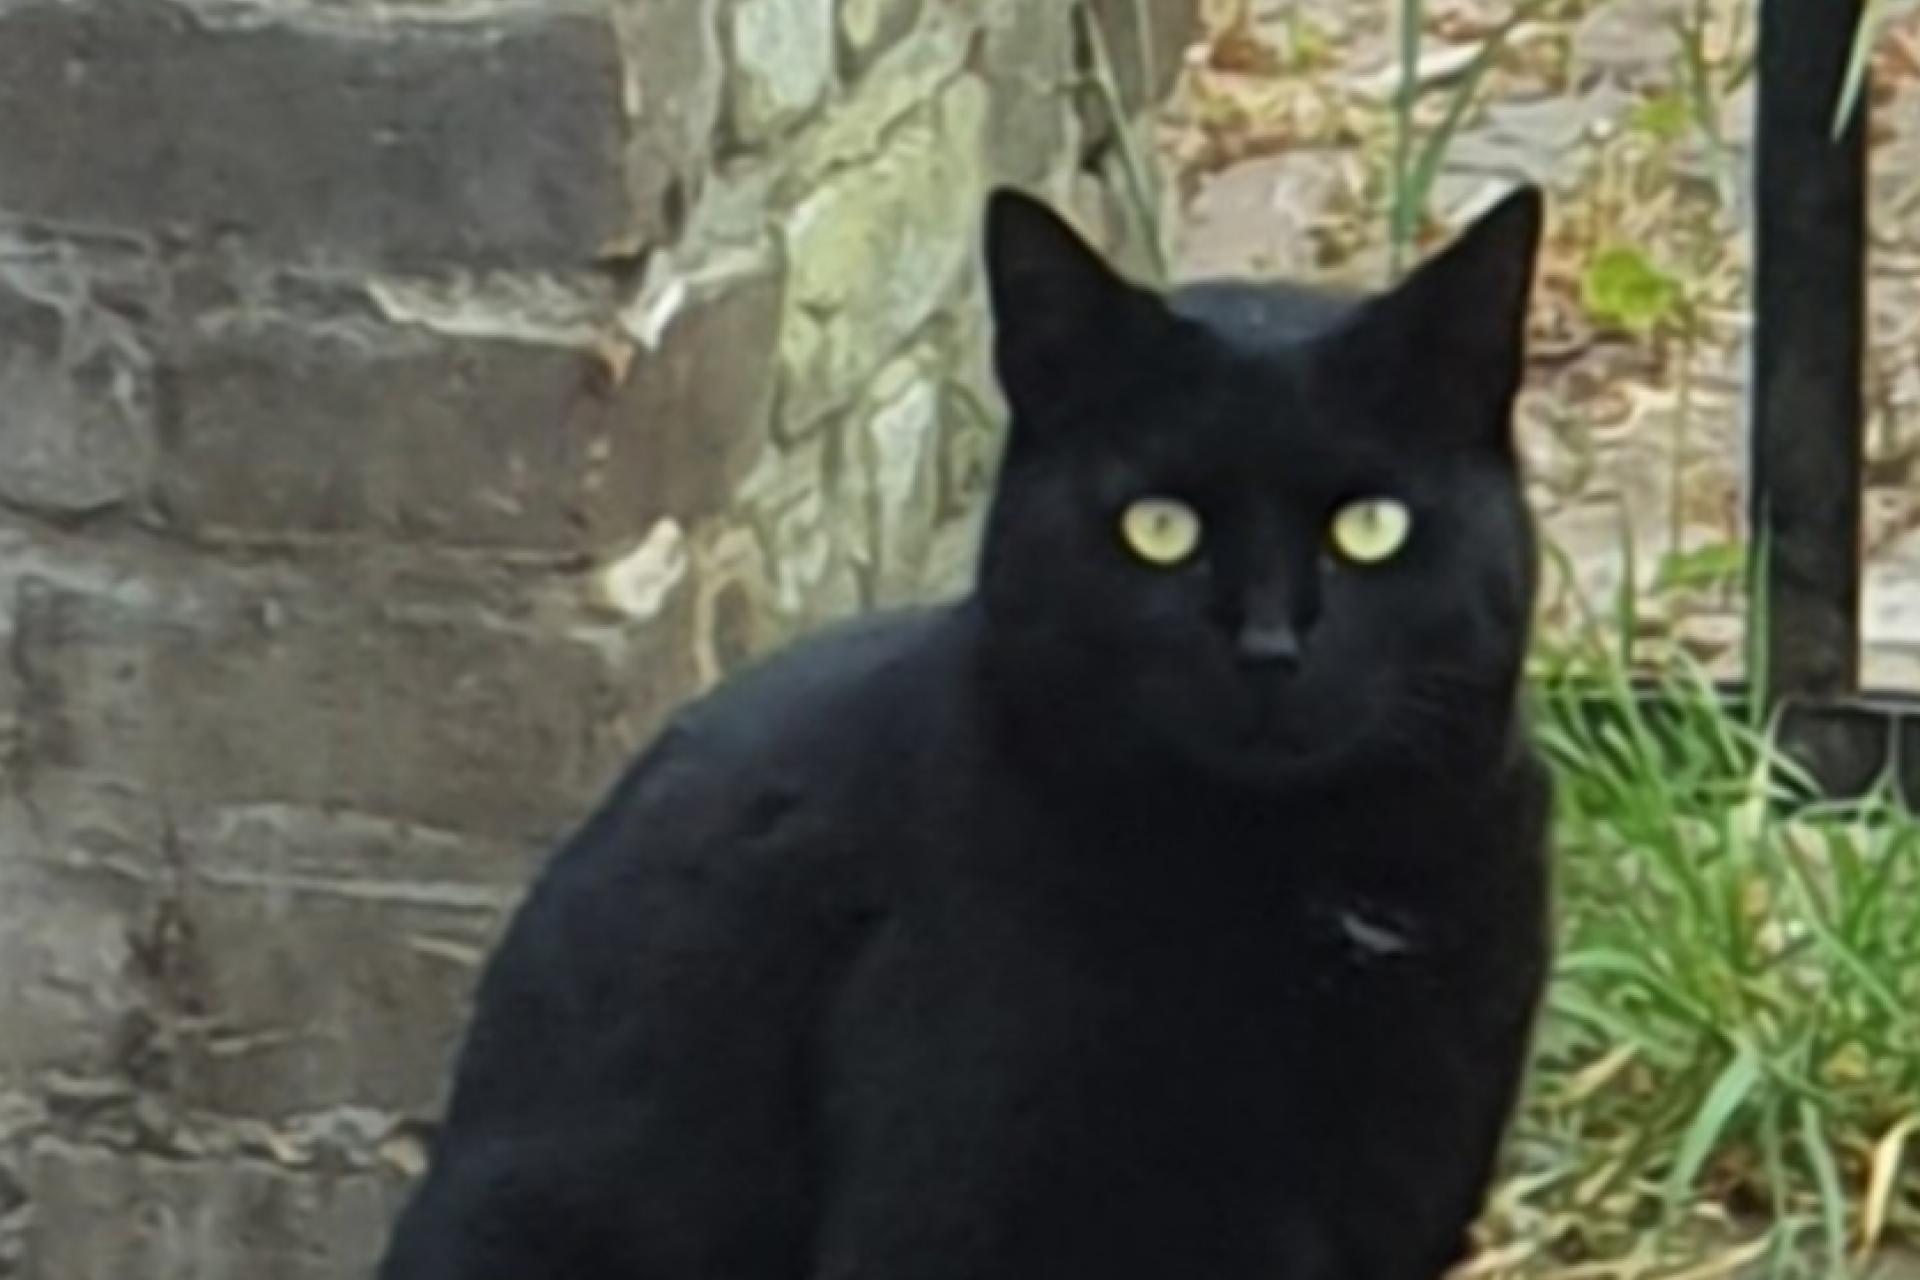 Zwarte poes, kat, omgeving centrum Doesburg. Vermist vanaf 20-08-2020